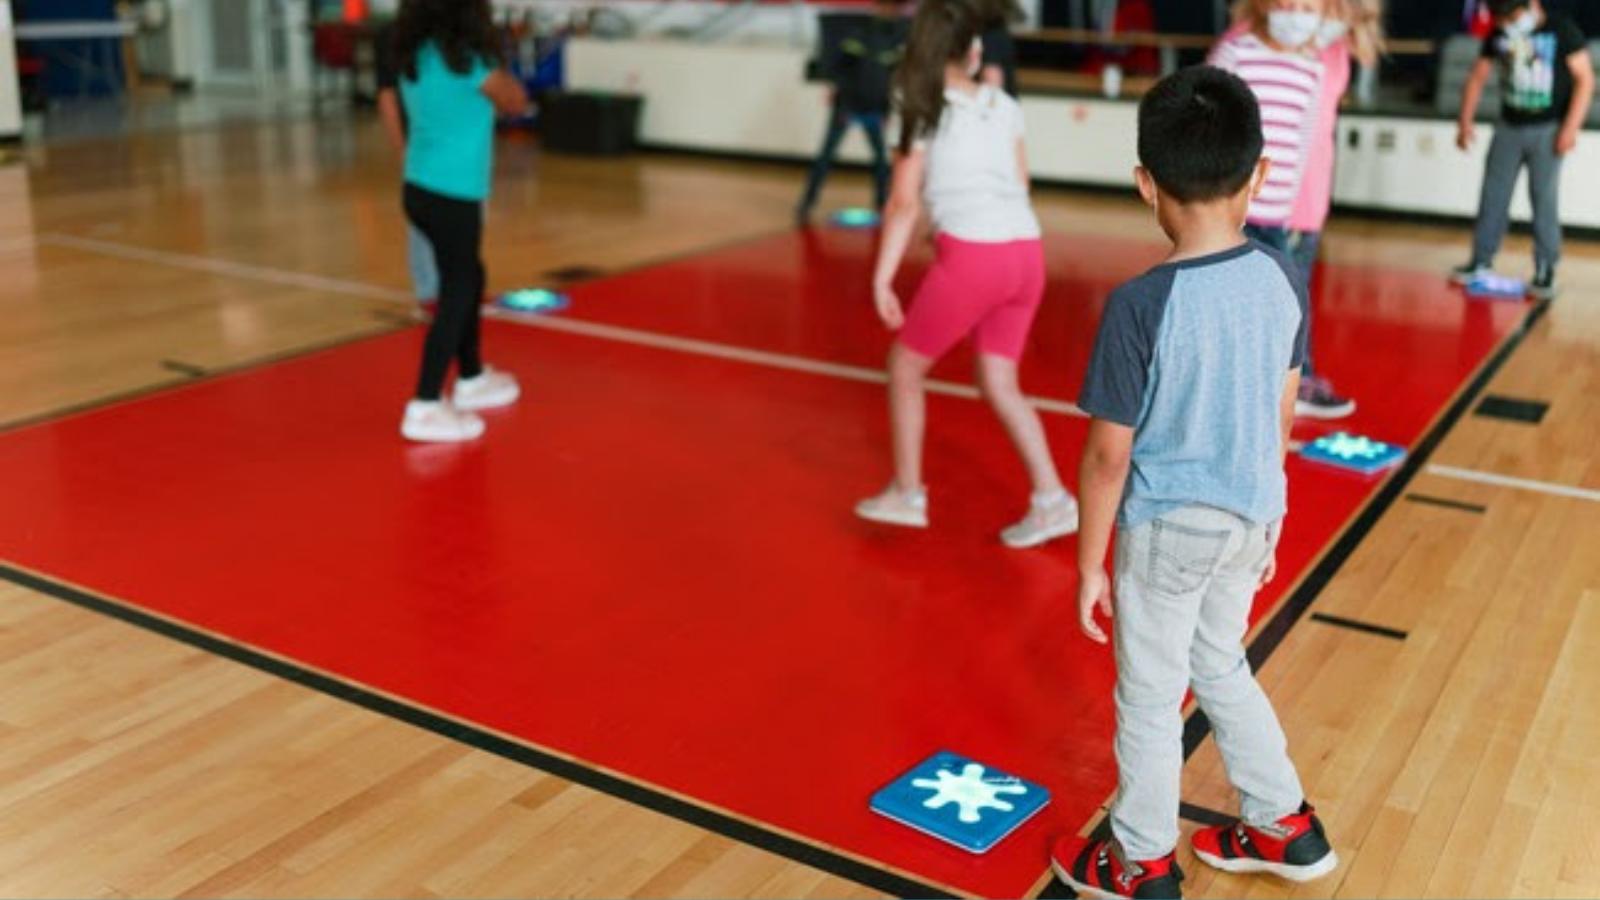 Winchester Public Schools Advances METRICs Program with Unruly Splats